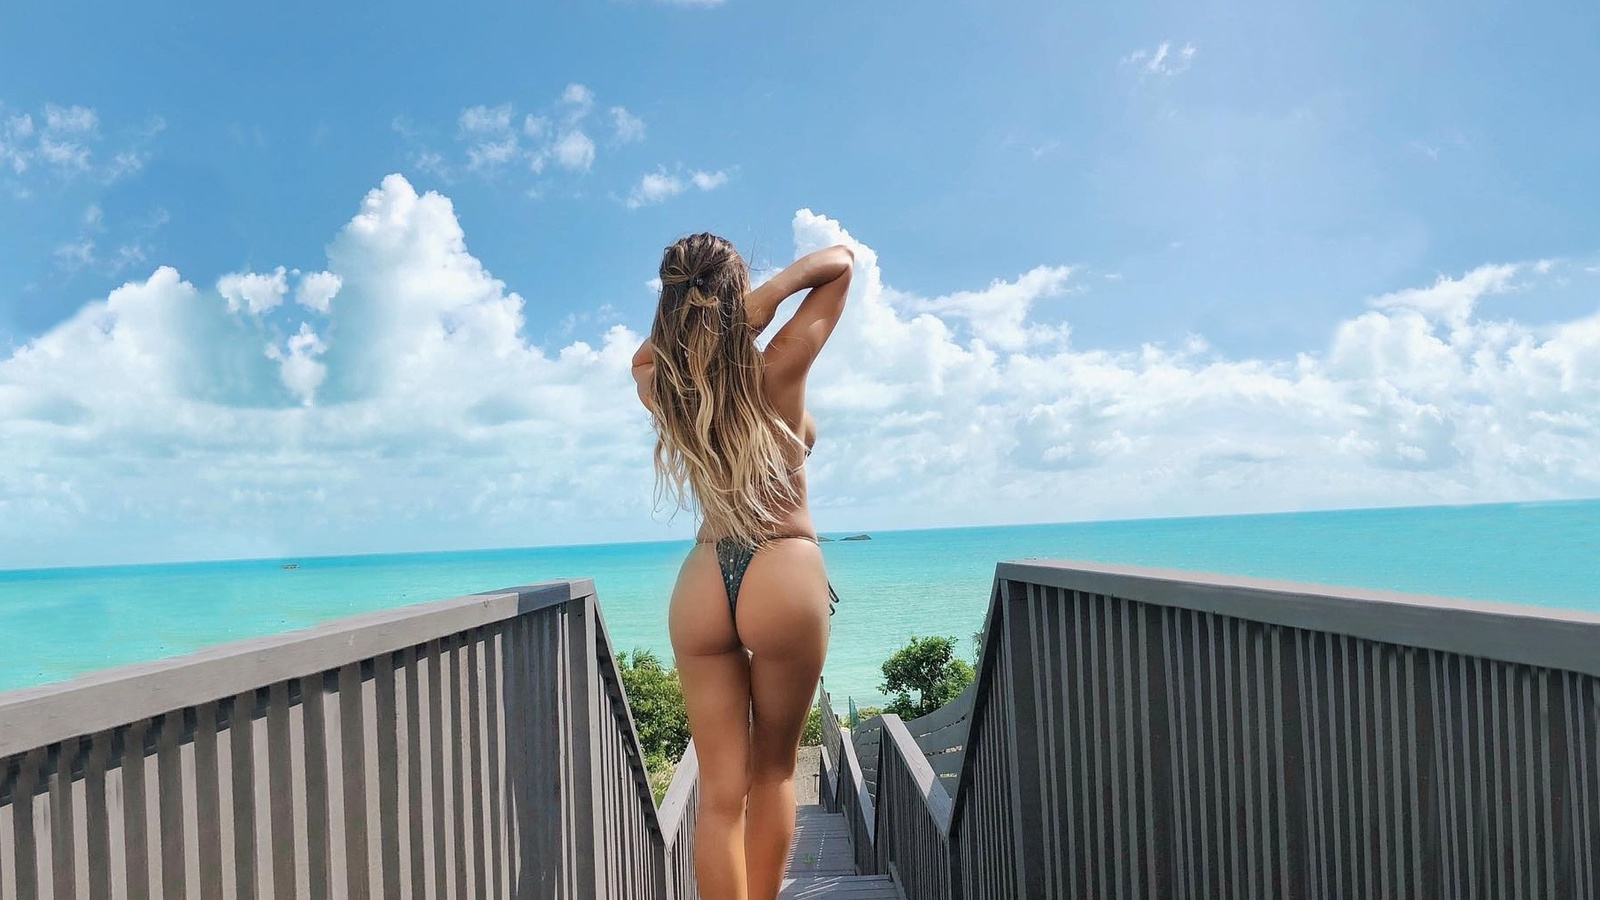 julianne kissinger, девушка, модель, море, голубое, лето